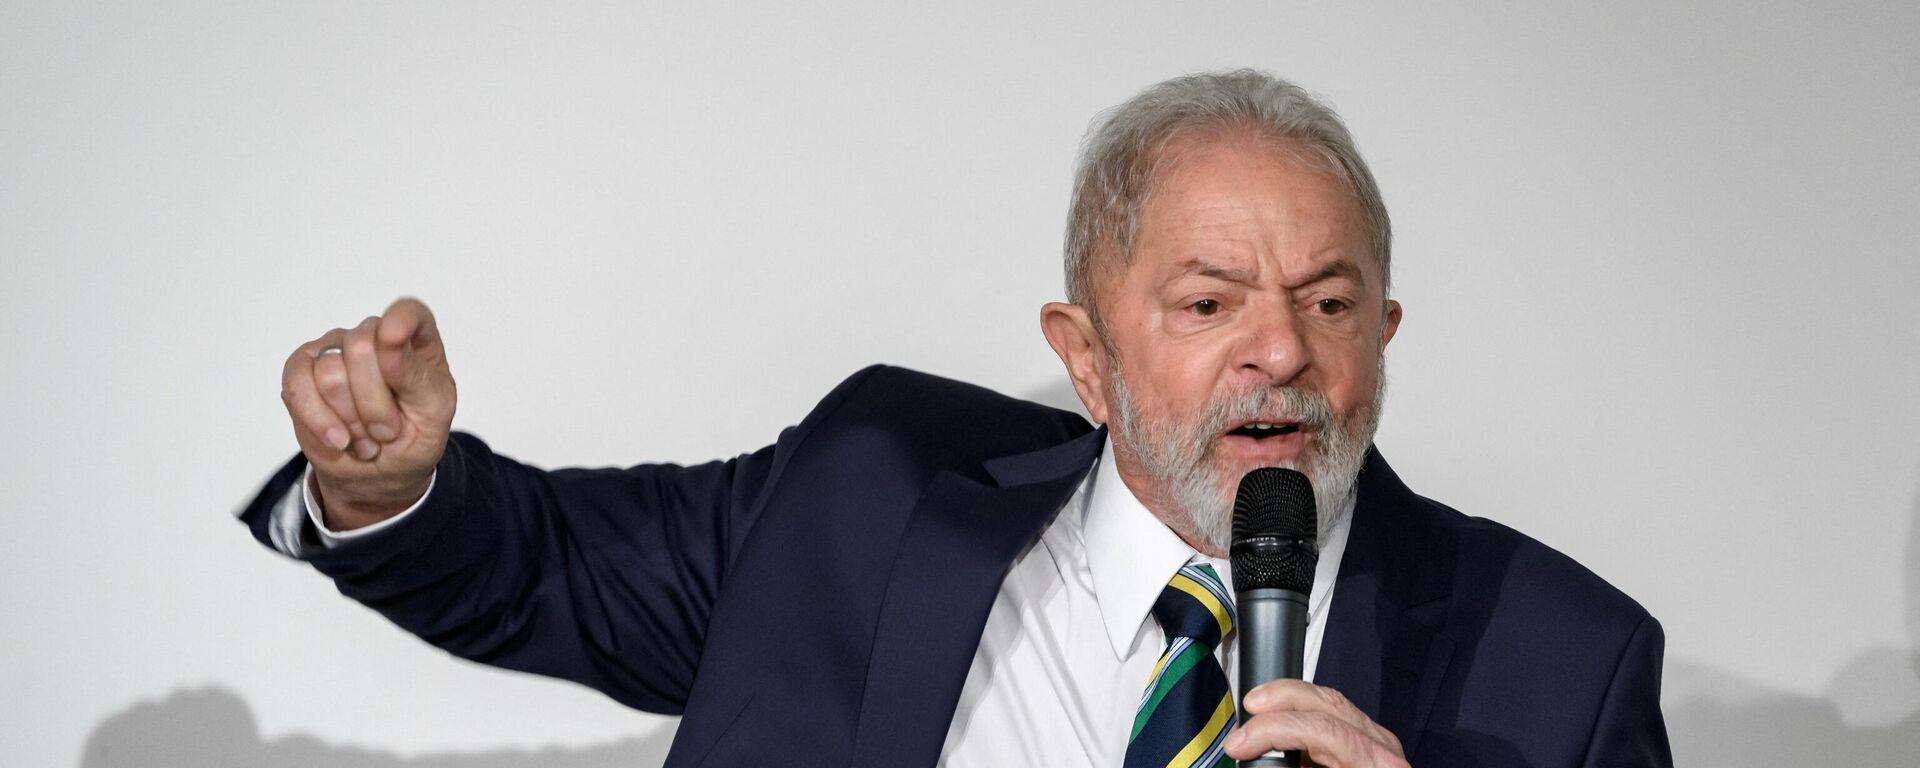 Luiz Inácio Lula da Silva , expresidente de Brasil - Sputnik Mundo, 1920, 29.06.2021